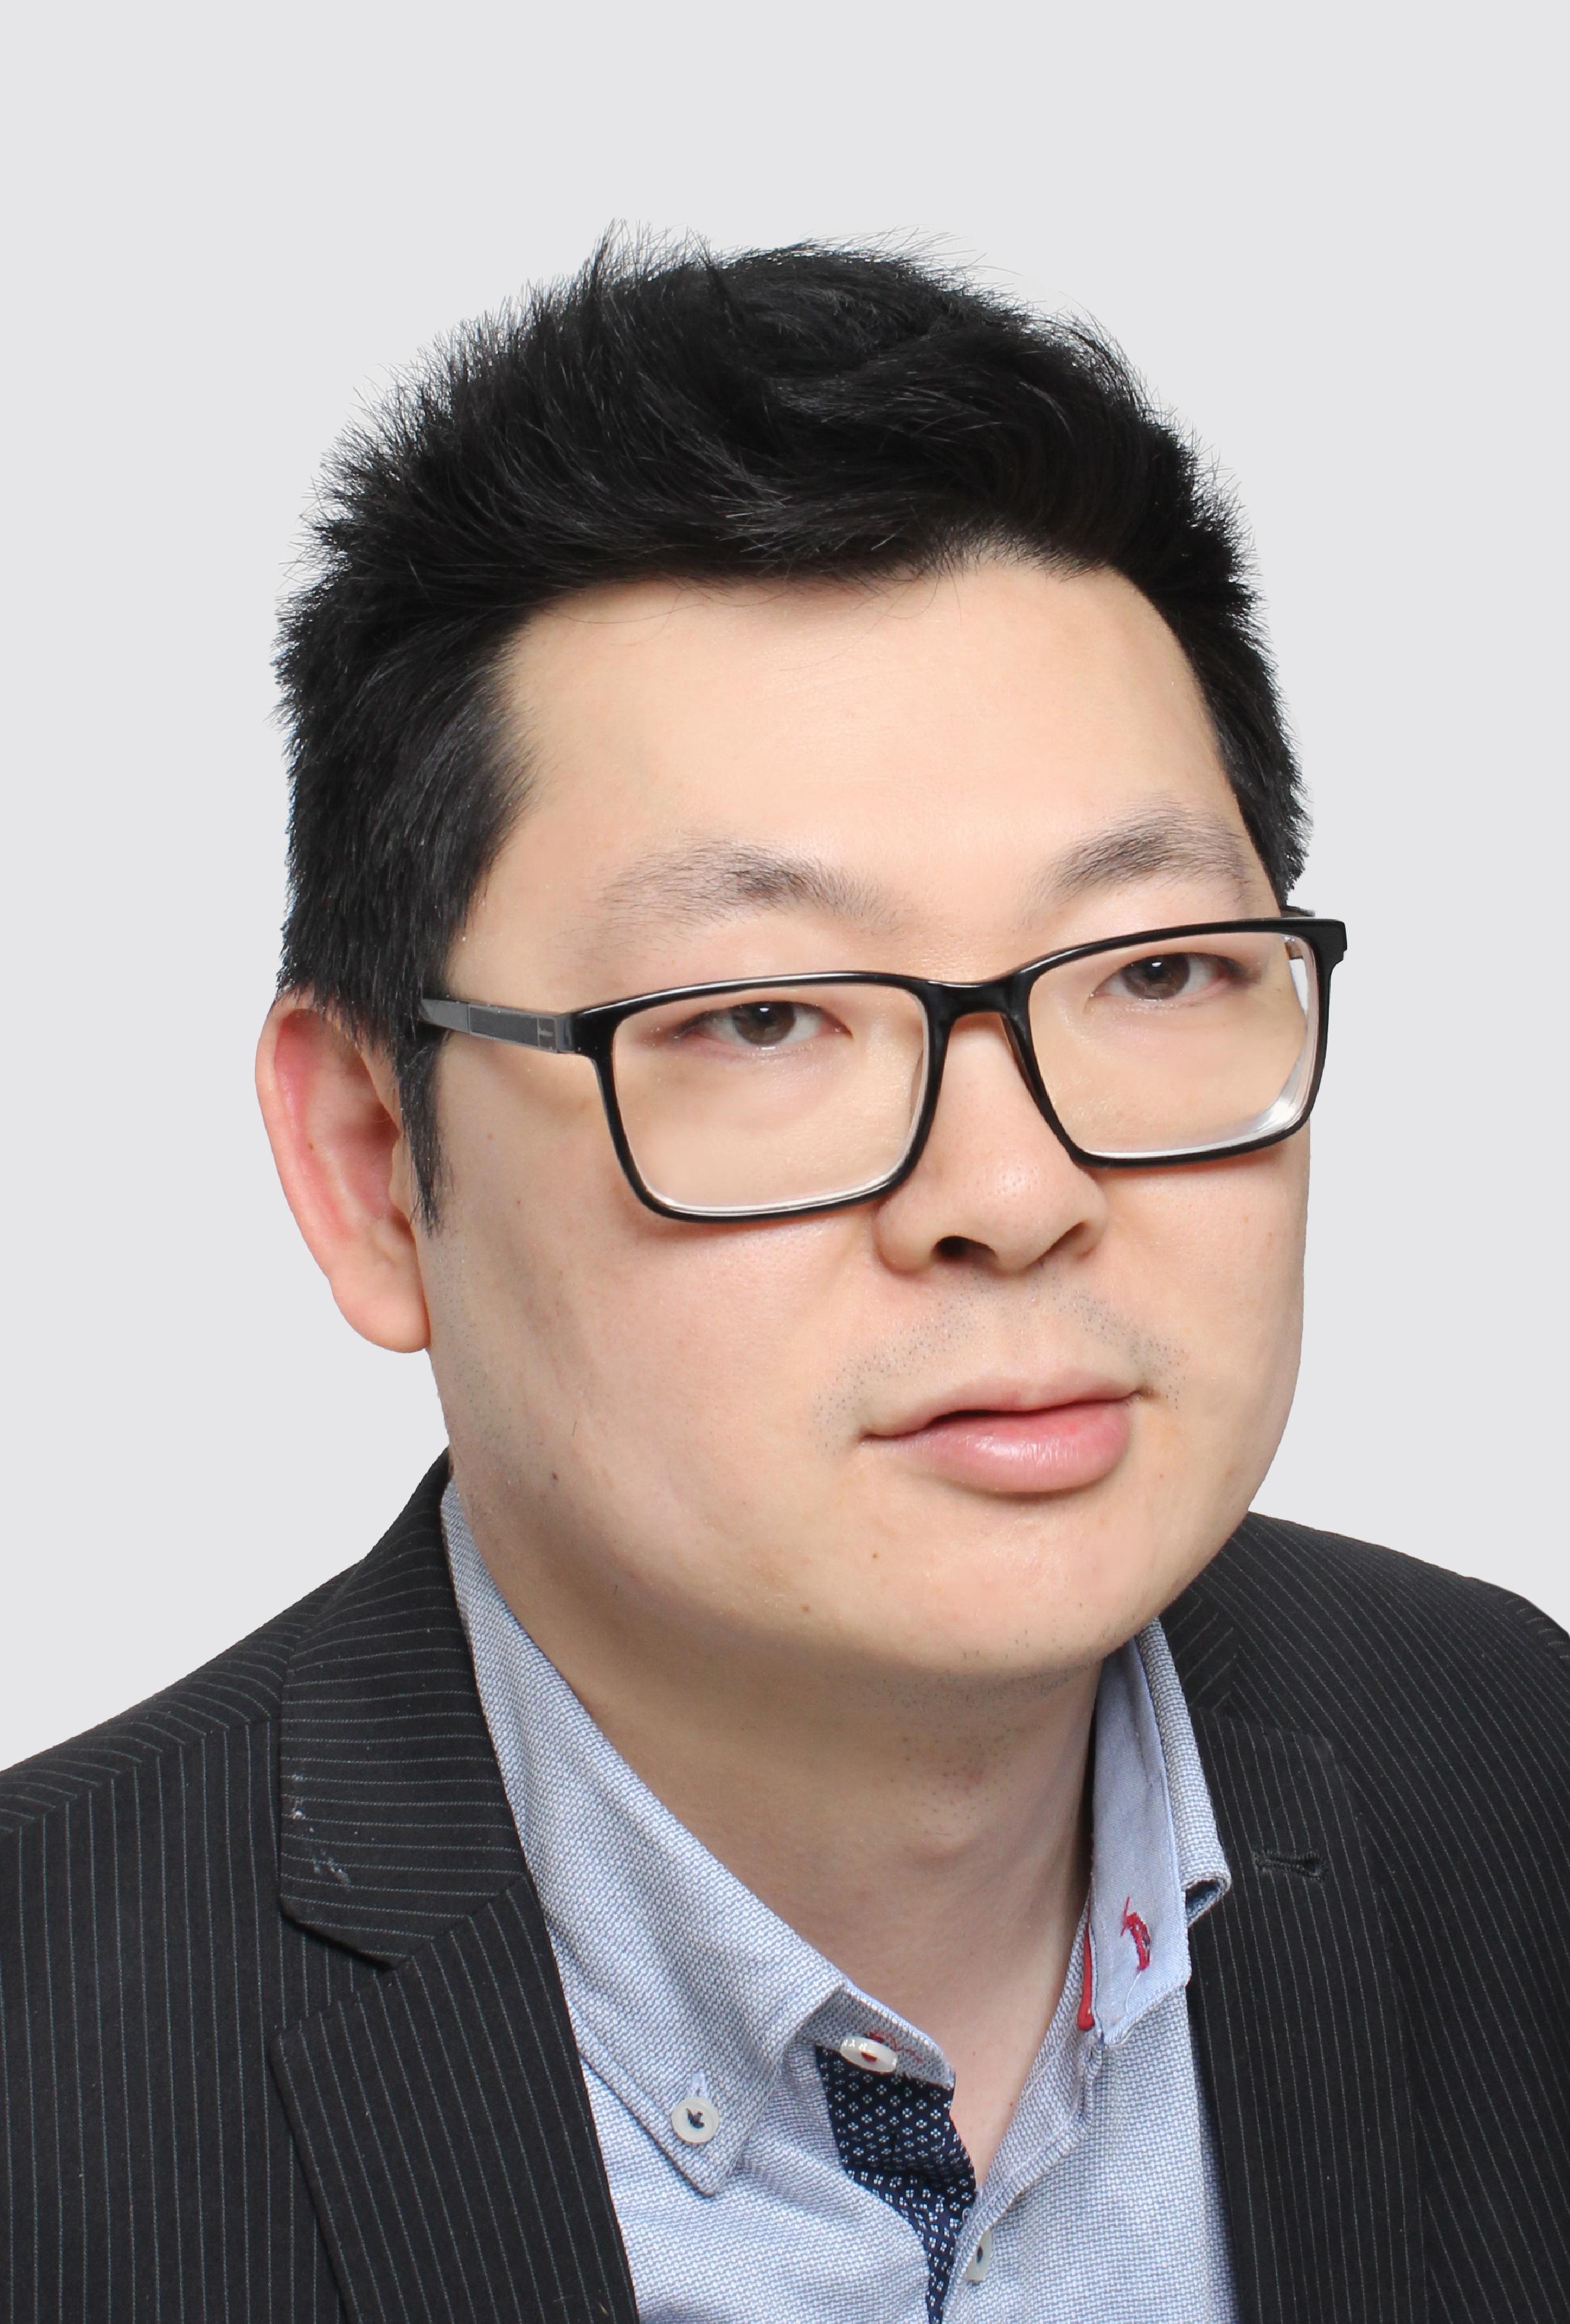 Jiasheng Tang - Manager, Sales & Product Management, EFLA Oy